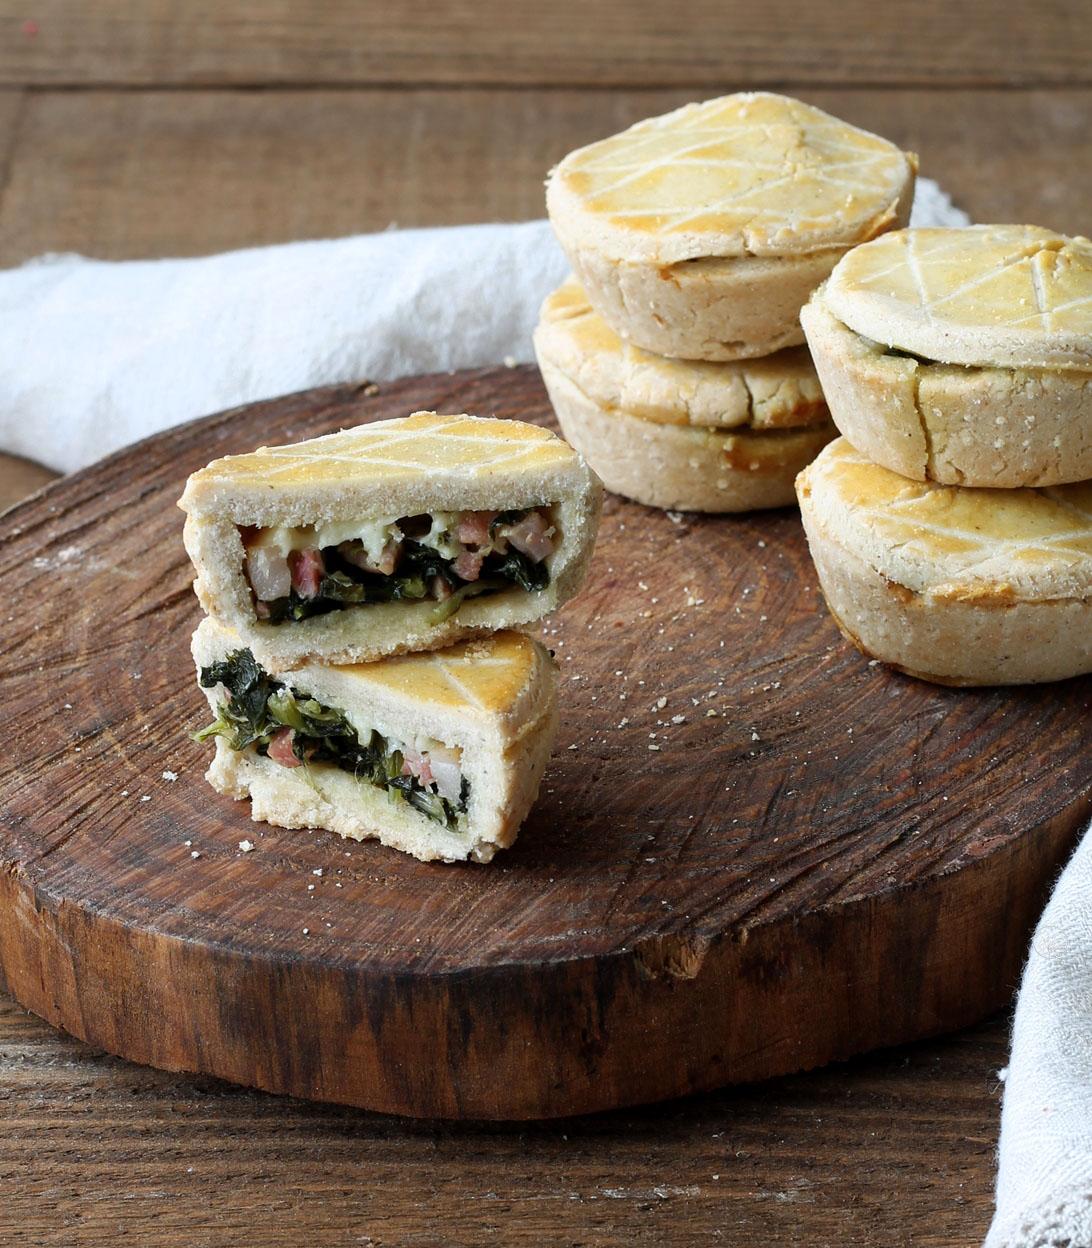 Mini torta salata alla cicoria senza glutine - La Cassata Celiaca